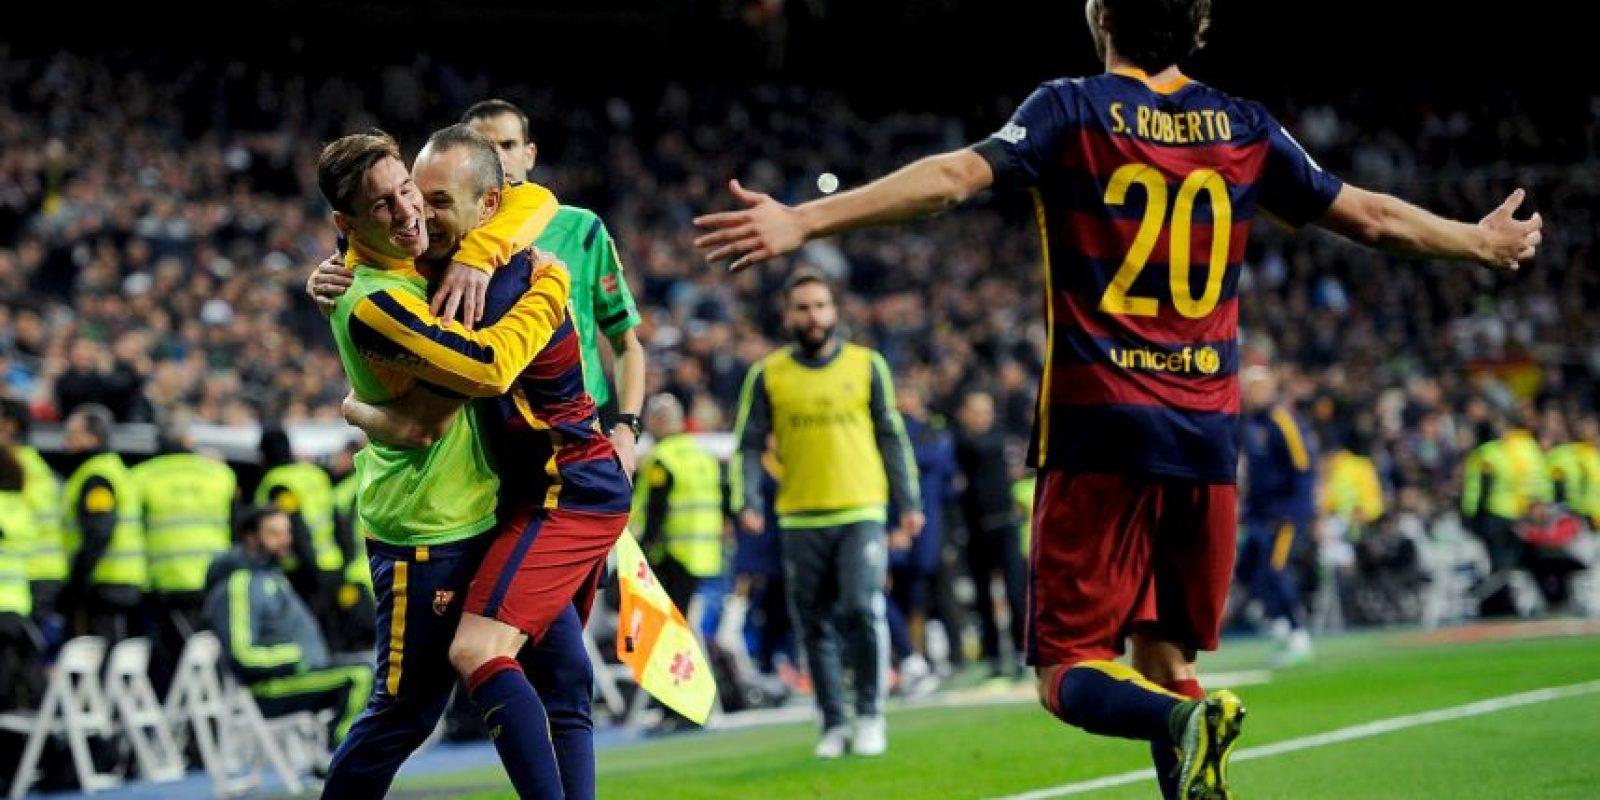 Iniesta marcó el tercer gol al minuto 53 Foto:Getty Images